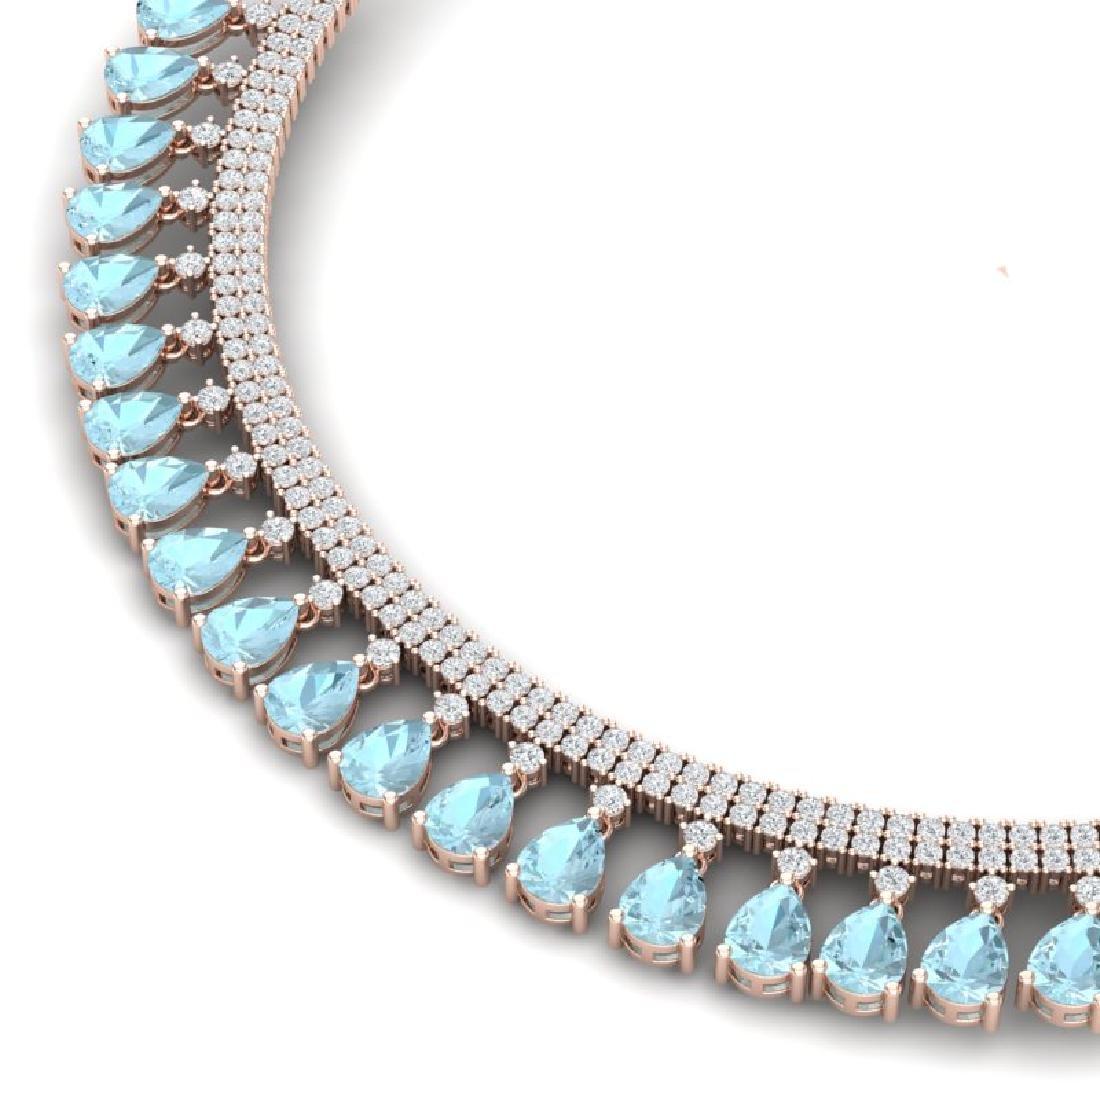 43.05 CTW Royalty Sky Topaz & VS Diamond Necklace 18K - 2